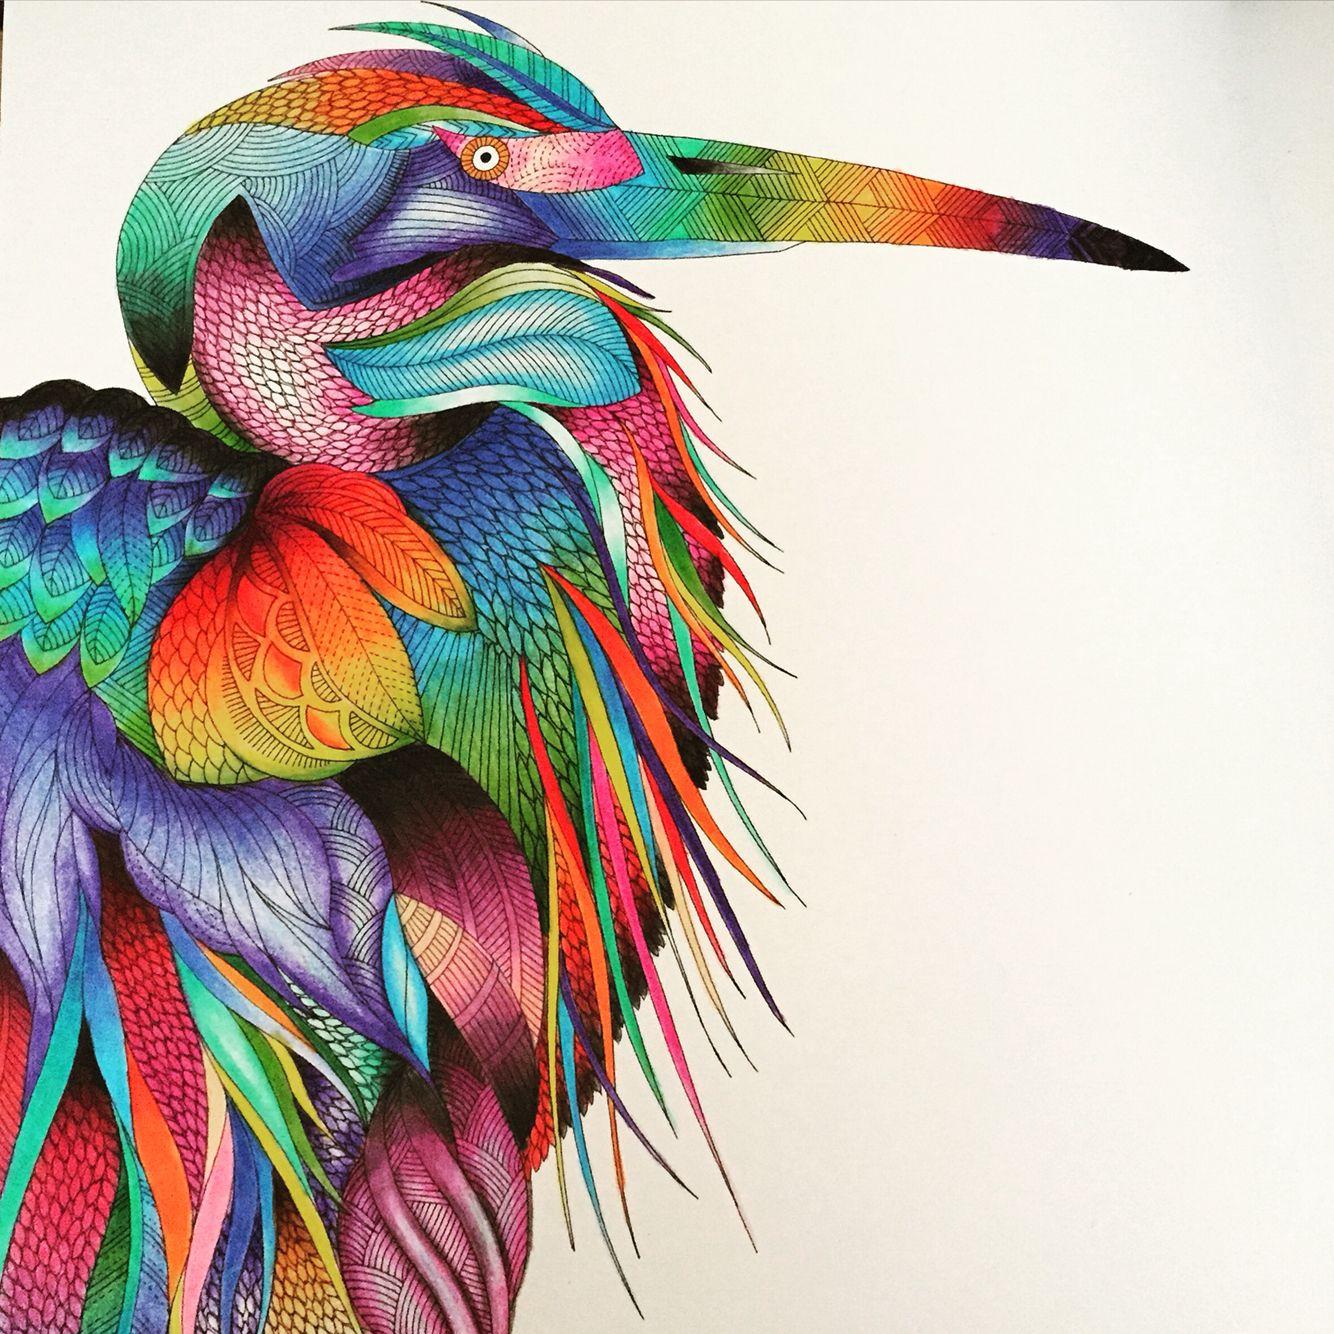 Completed From The Millie Marotta Animal Kingdom Colouring Book By Ins Animal Kingdom Colouring Book Millie Marotta Coloring Book Millie Marotta Animal Kingdom